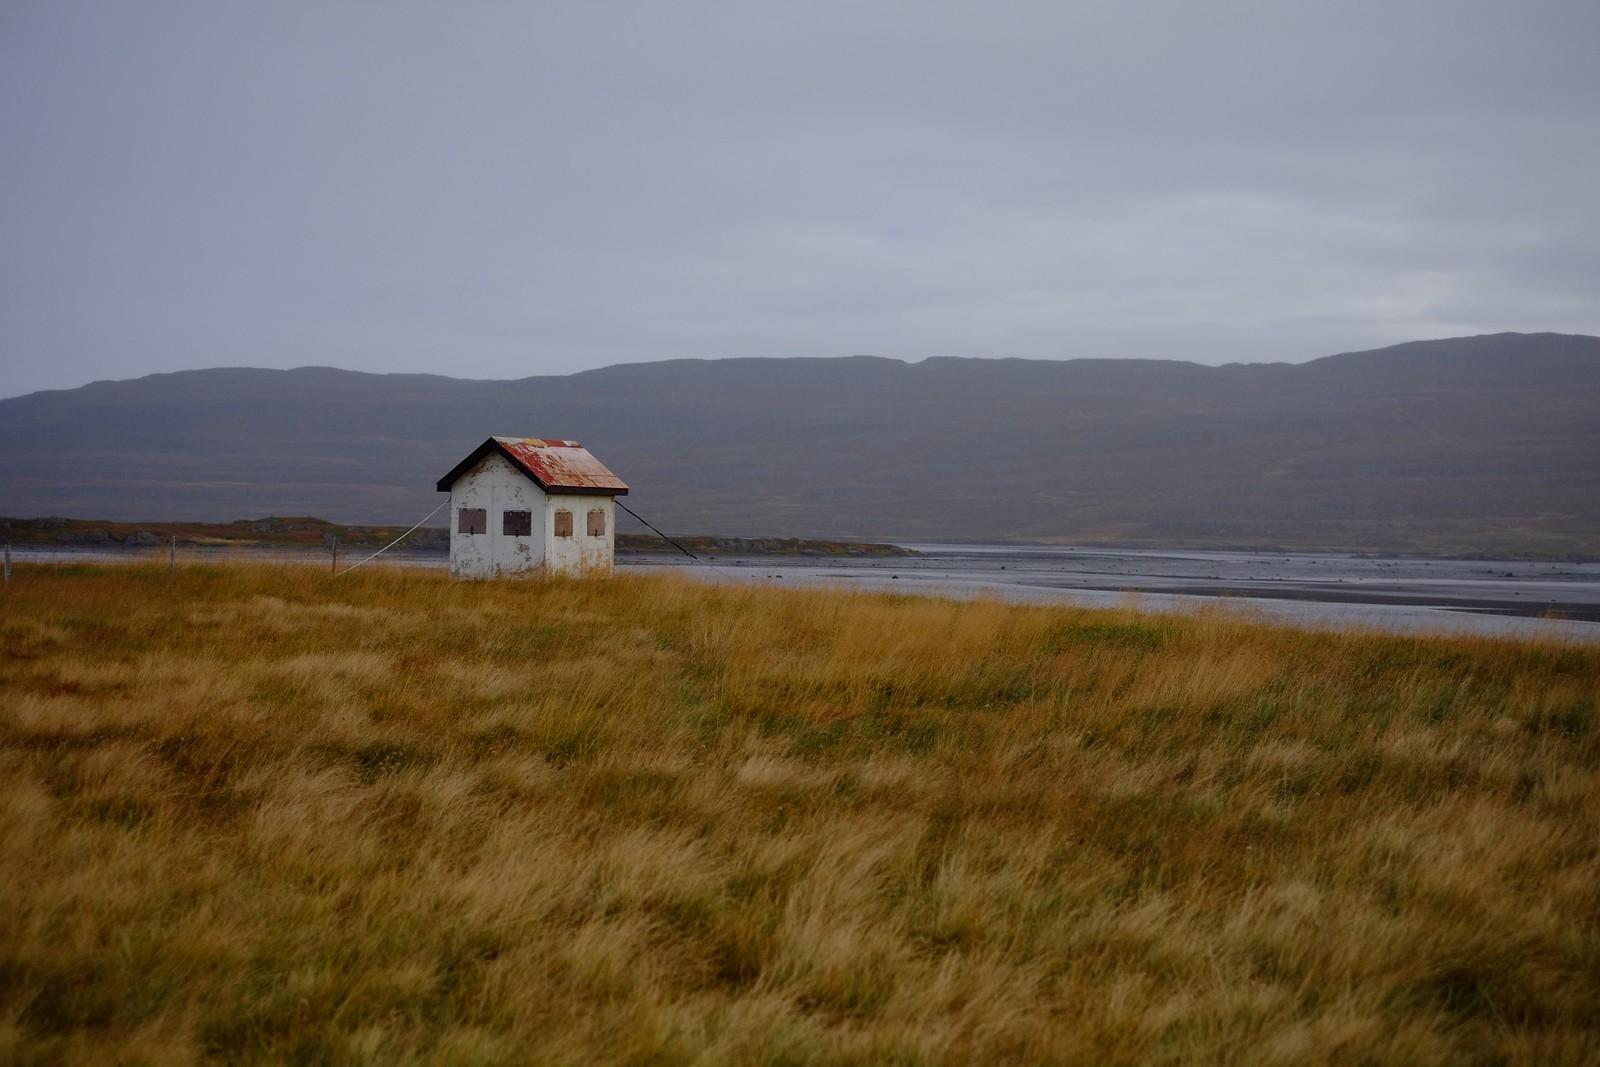 Little hut | by efo